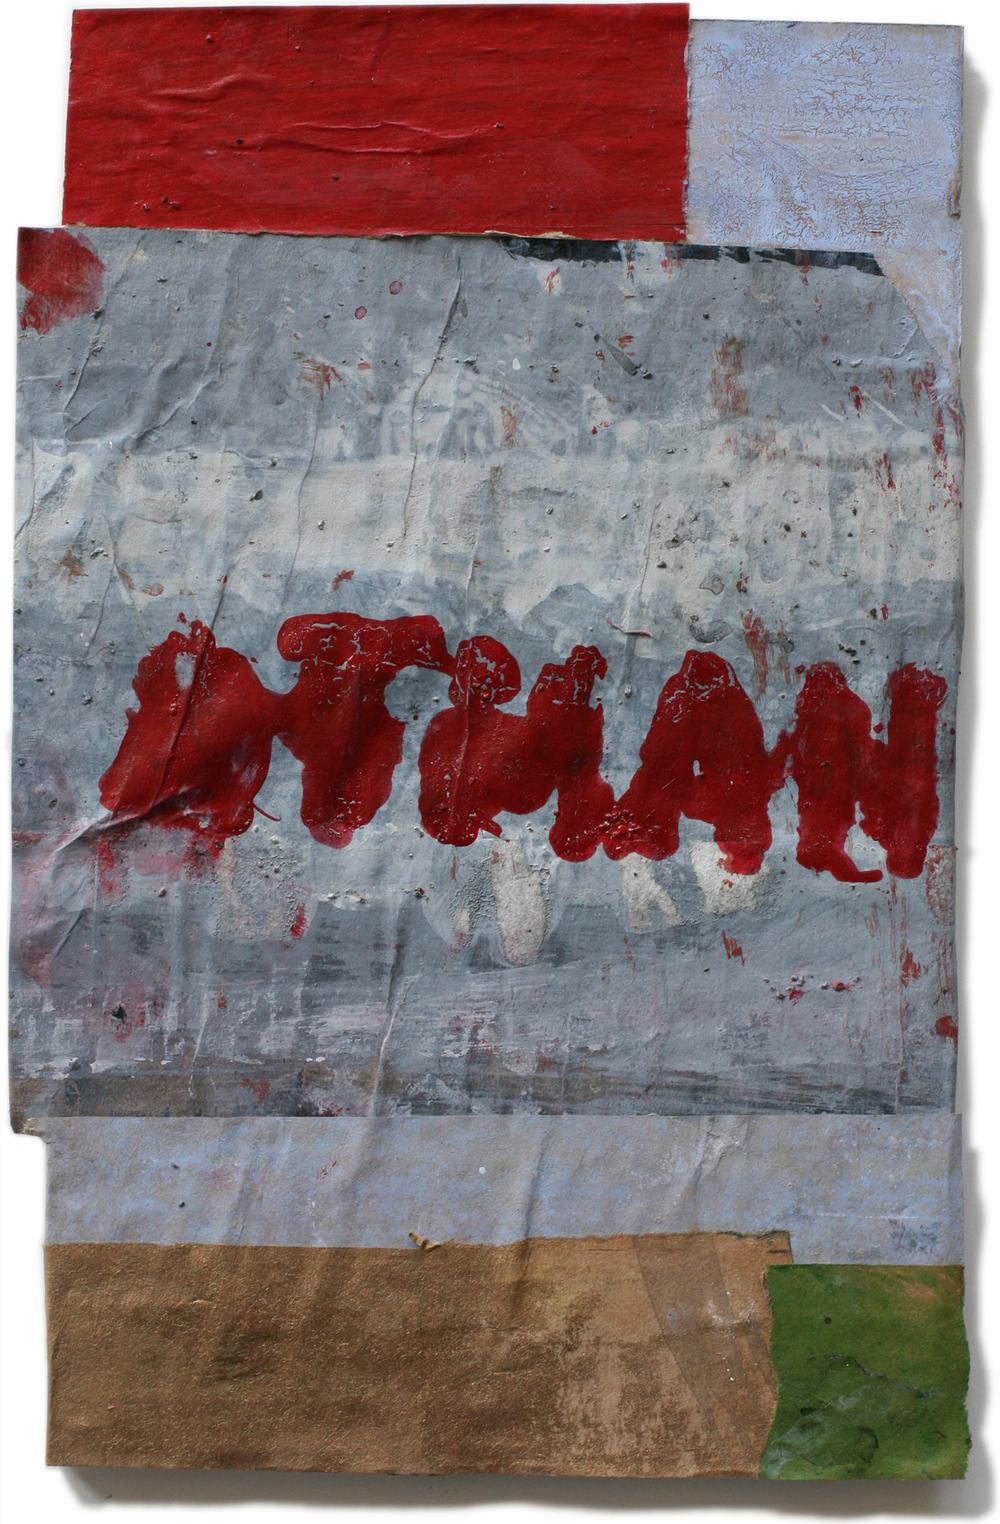 "Atman, 10"" x 6"", 2008-2010"